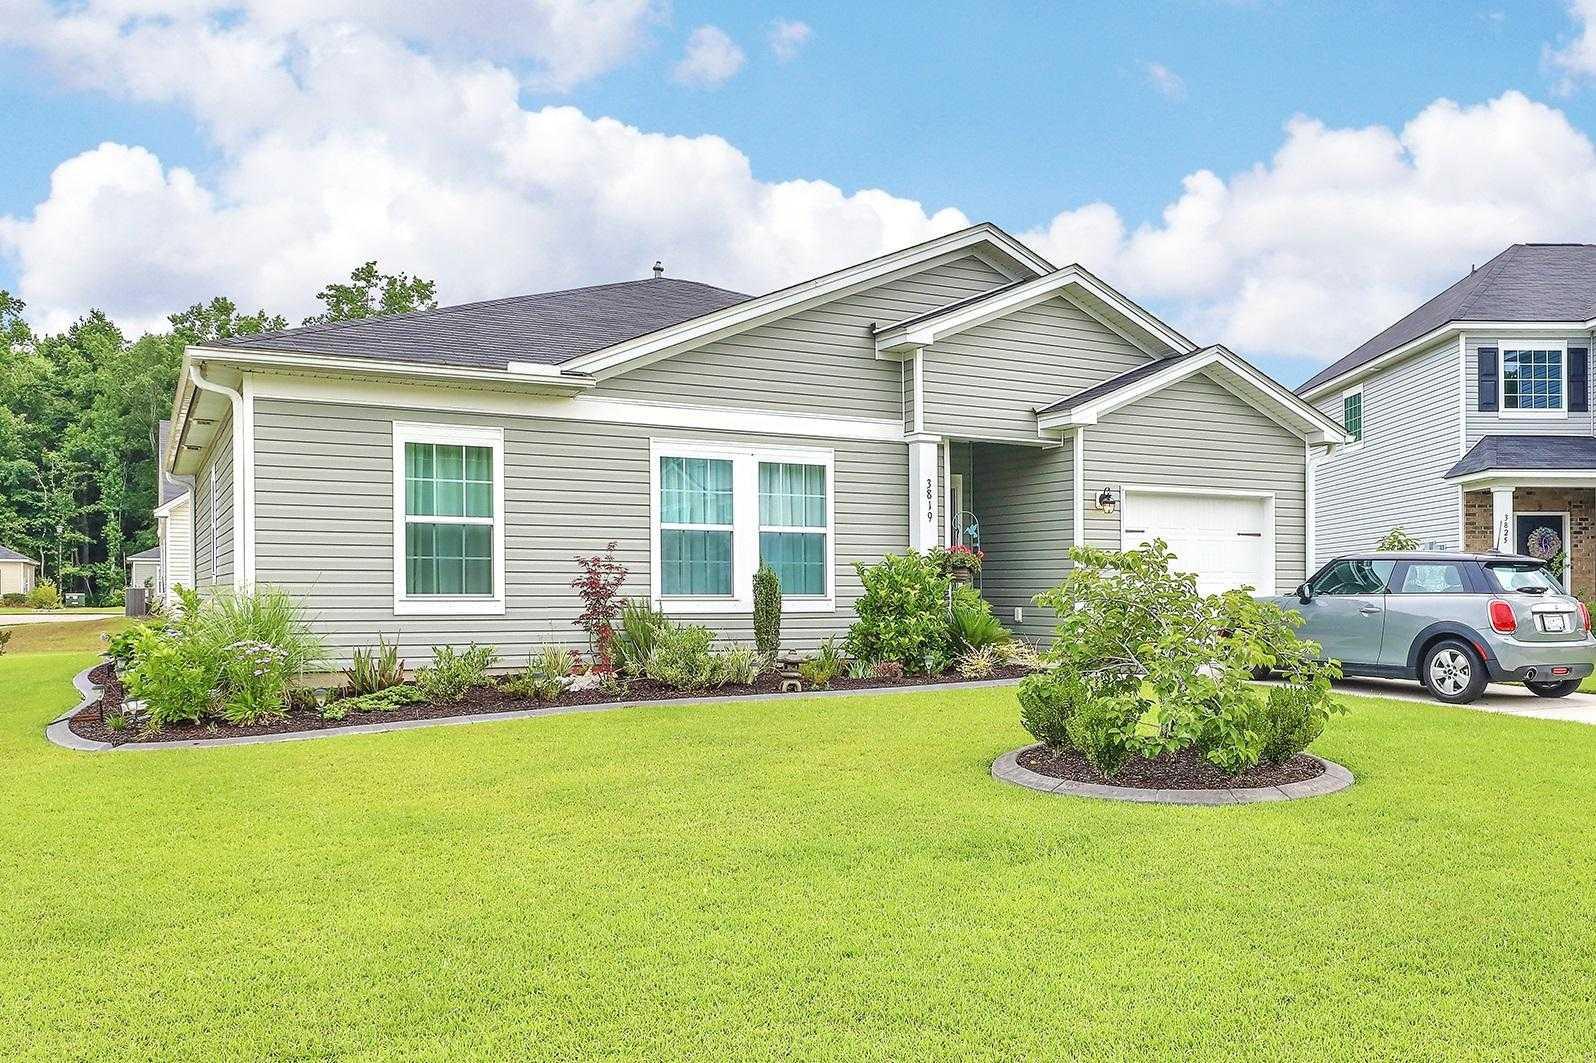 Sensational Homes For Sale In North Charleston Charleston Sc Area Home Interior And Landscaping Spoatsignezvosmurscom